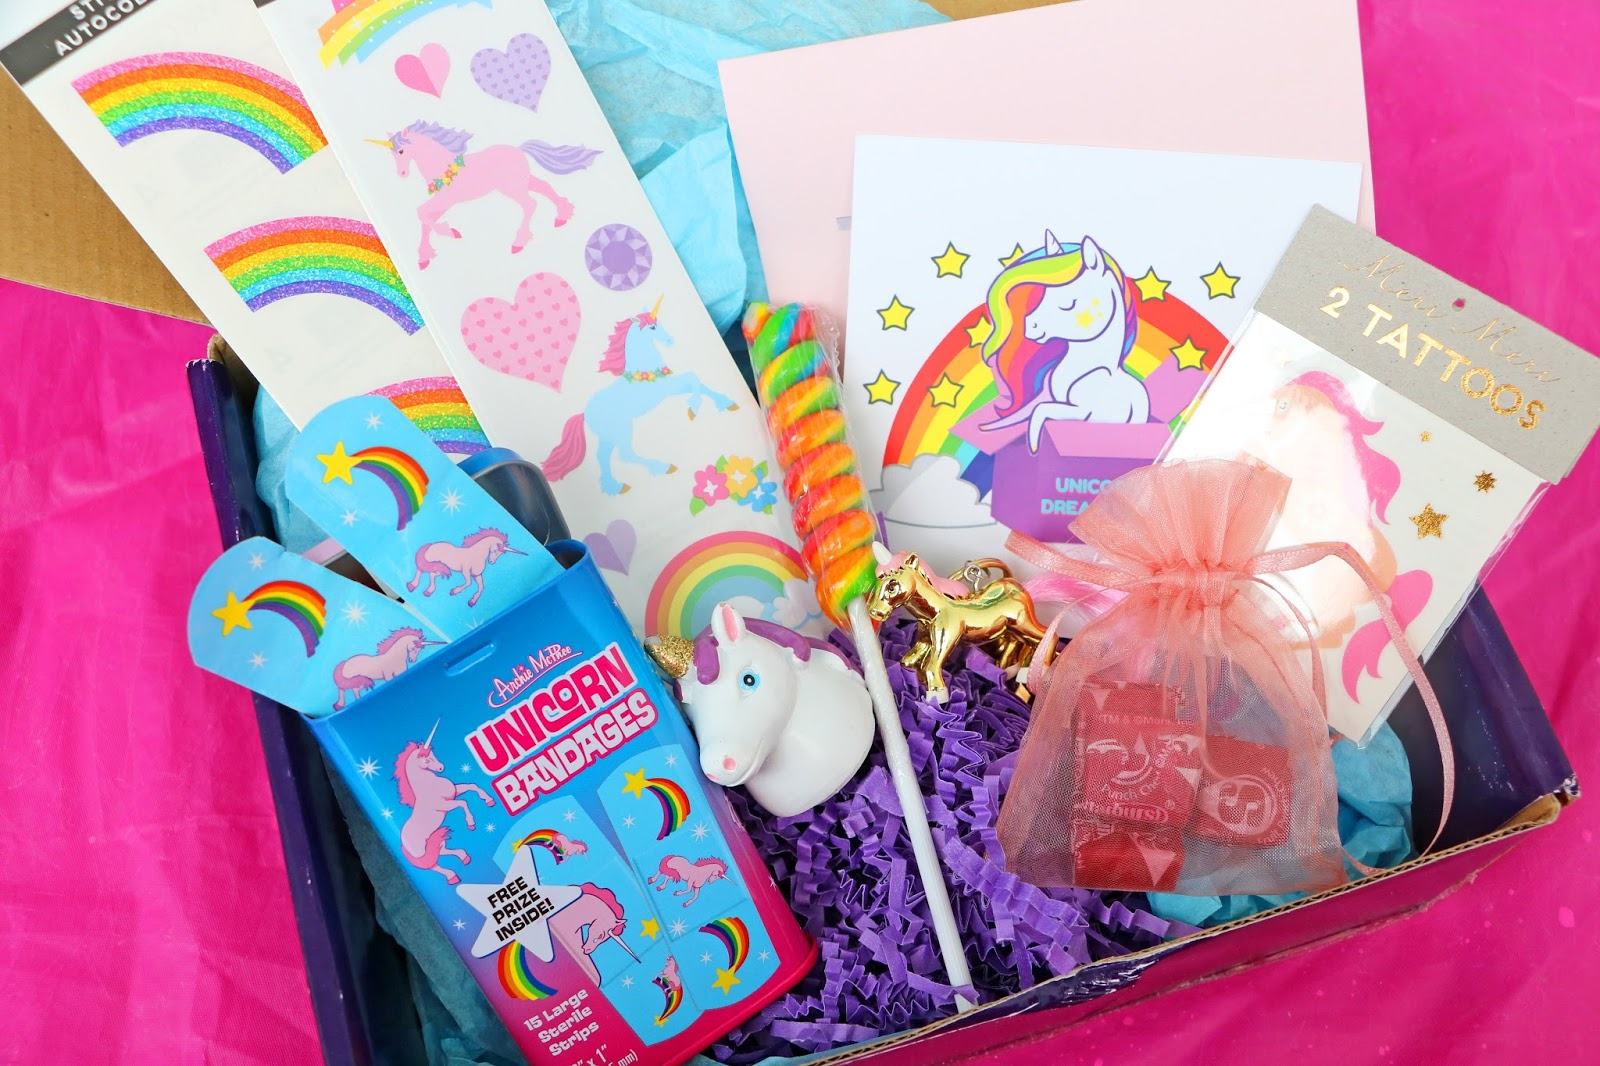 Unboxing the September 2017 Unicorn Dream Box